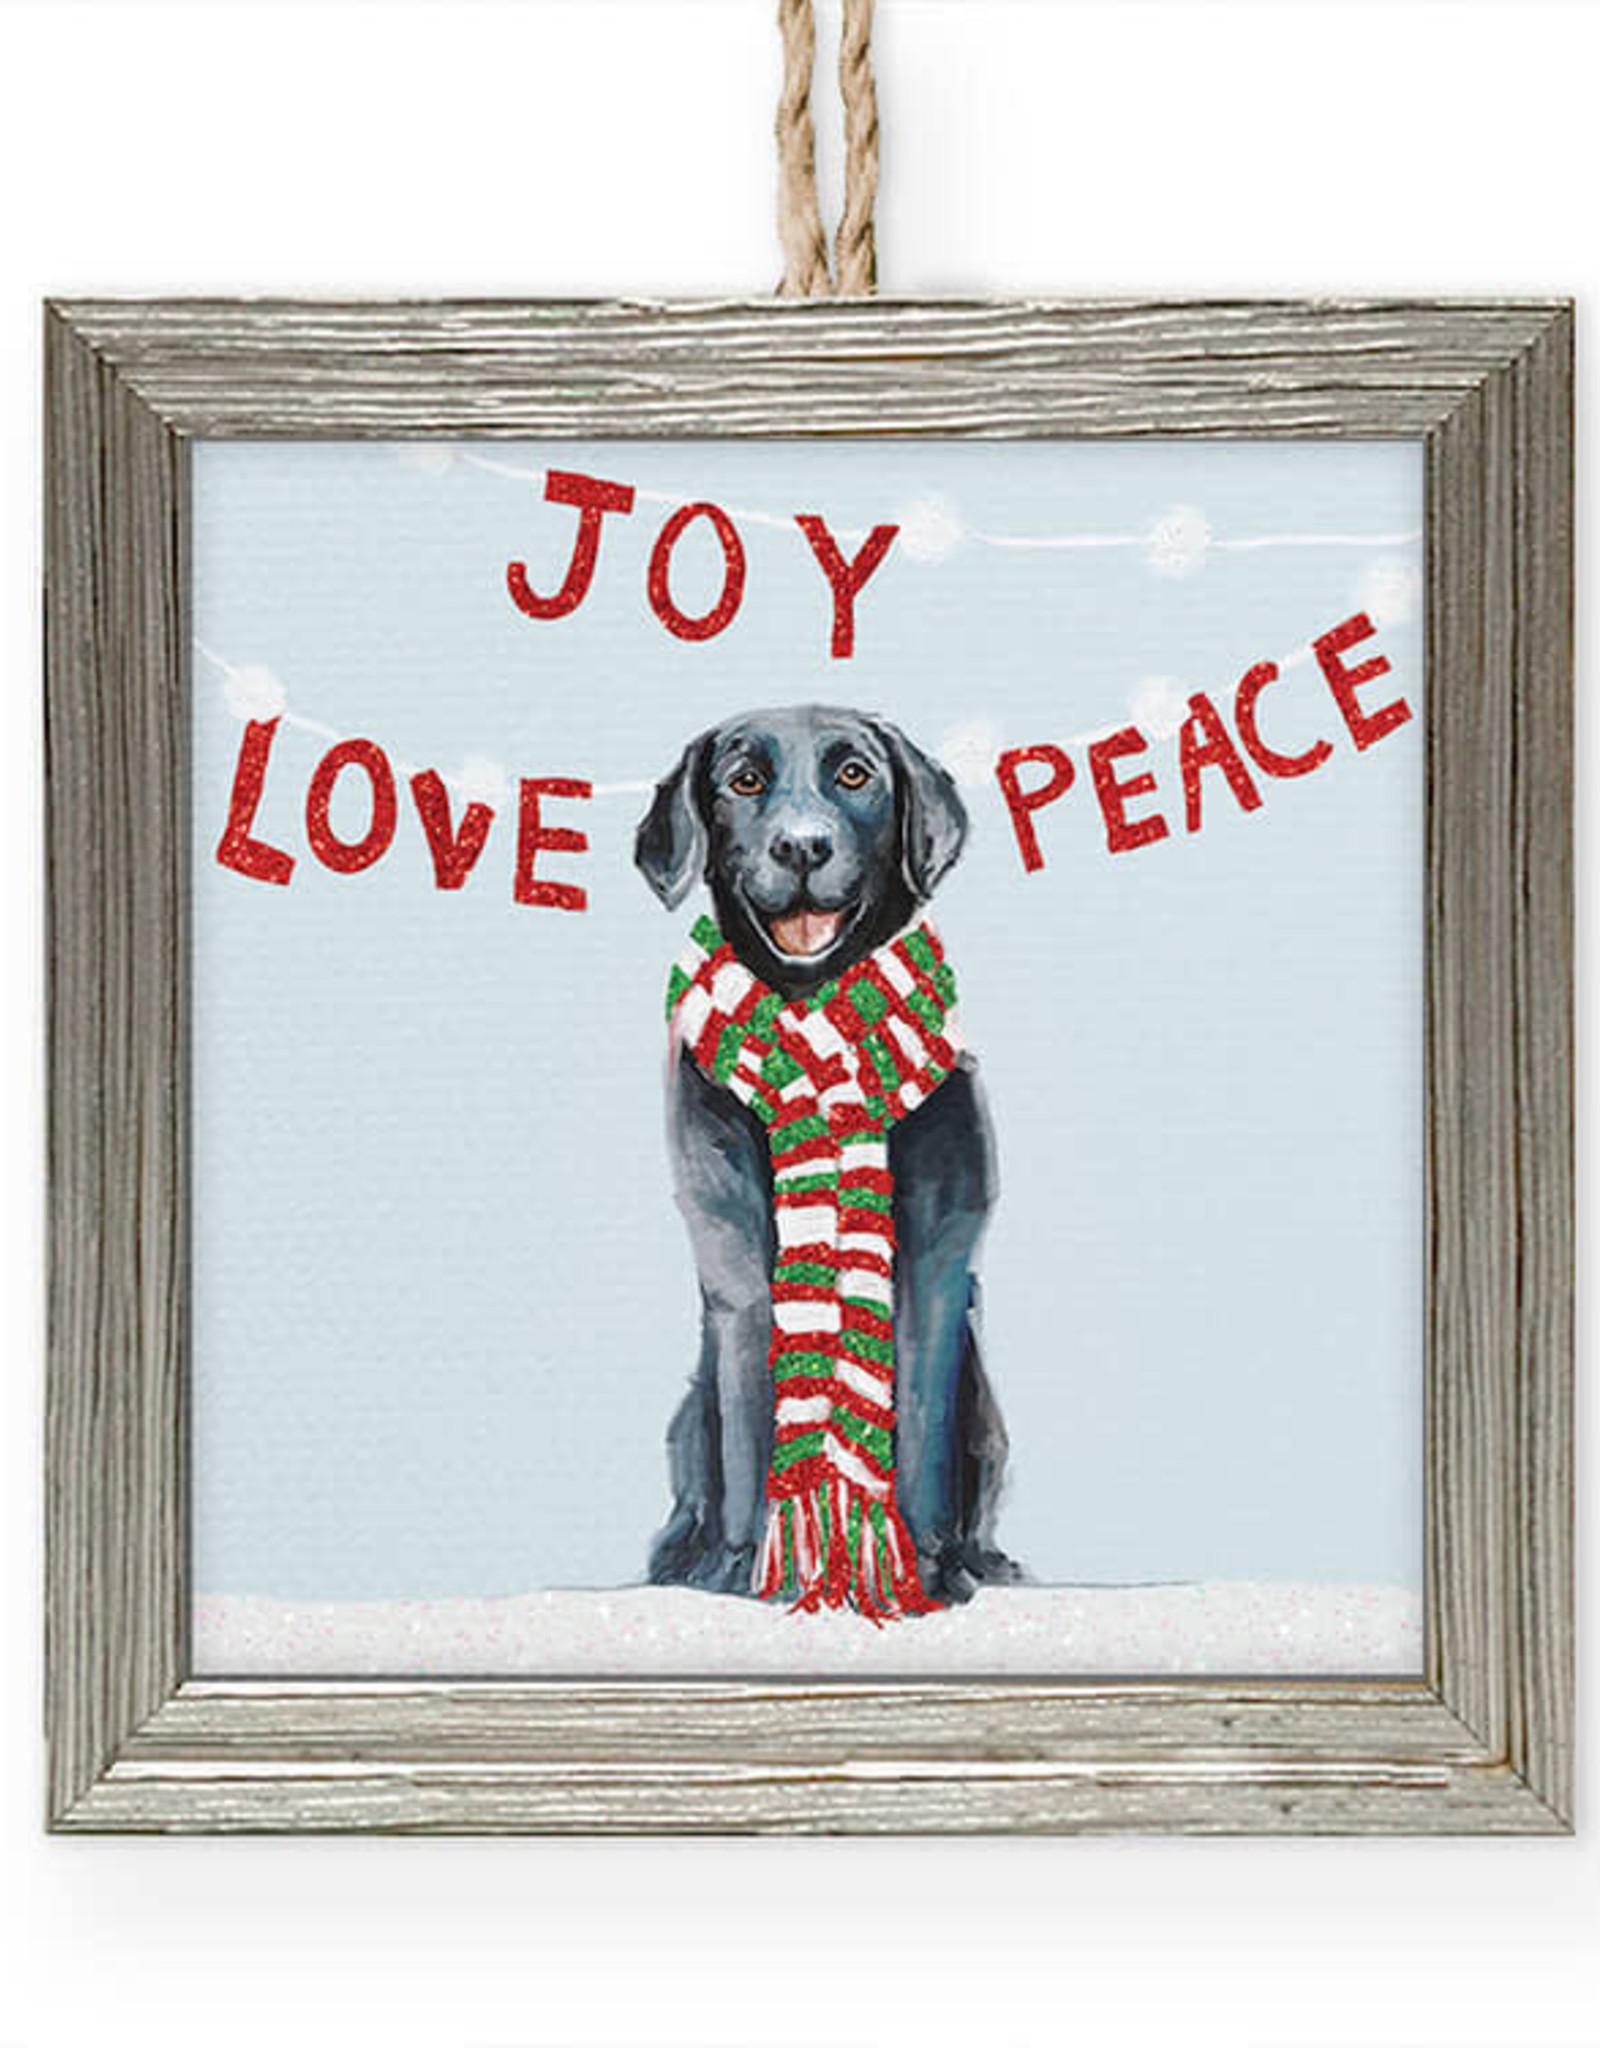 Greenbox Art Holiday - Joy Love Peace Embellish Framed Wooden Ornament